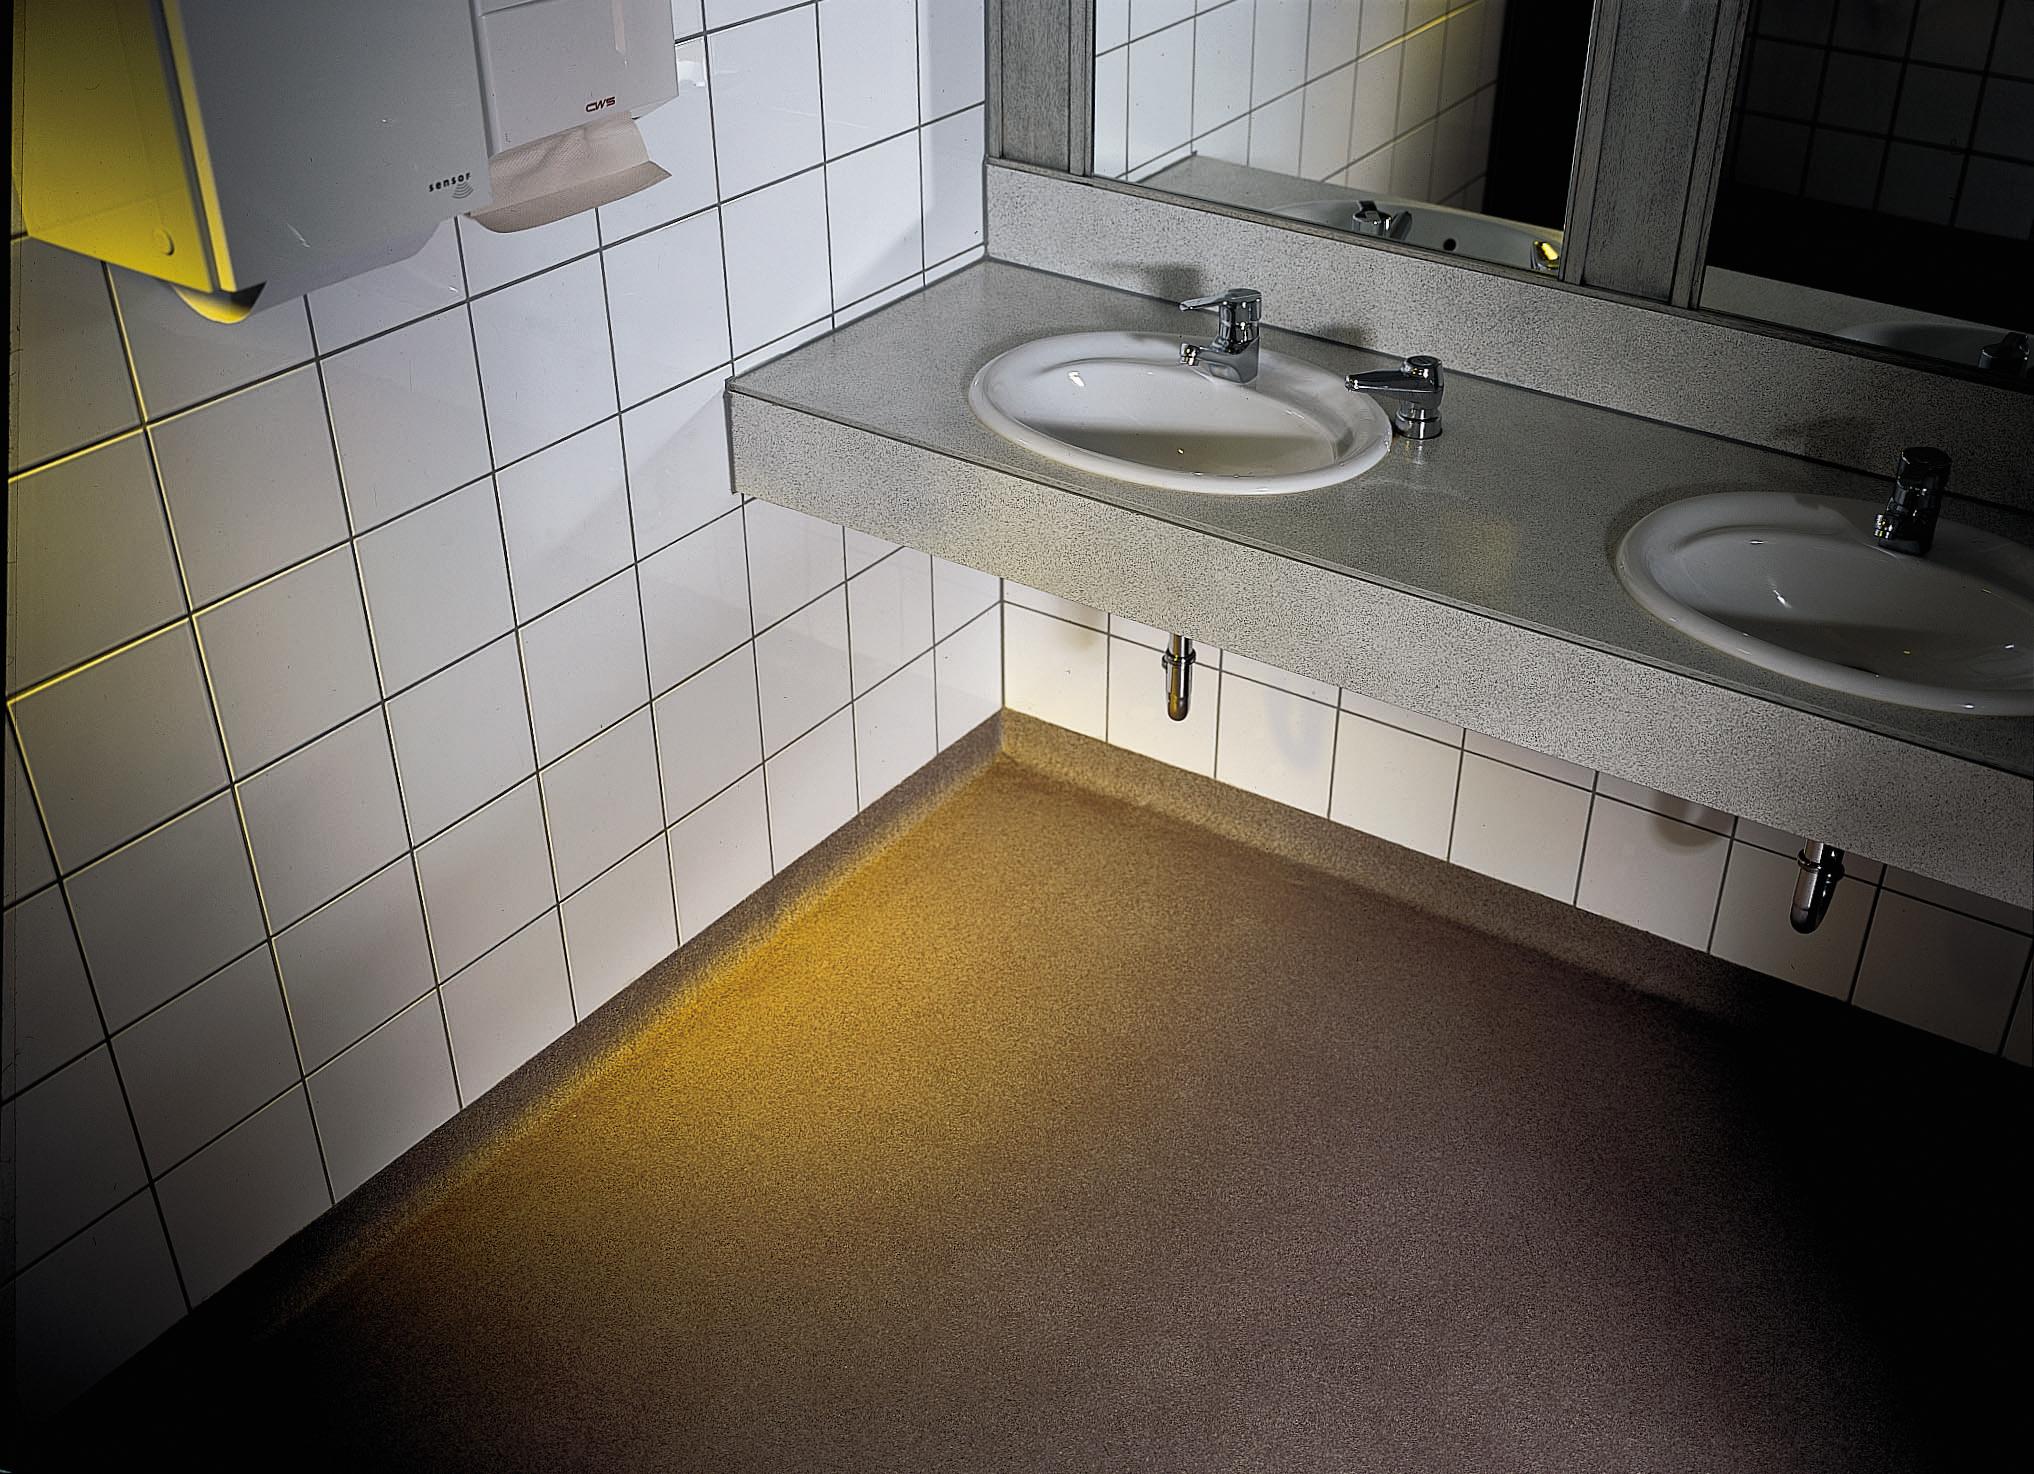 Restroom Flooring - Floors For Public Restrooms | Silikal